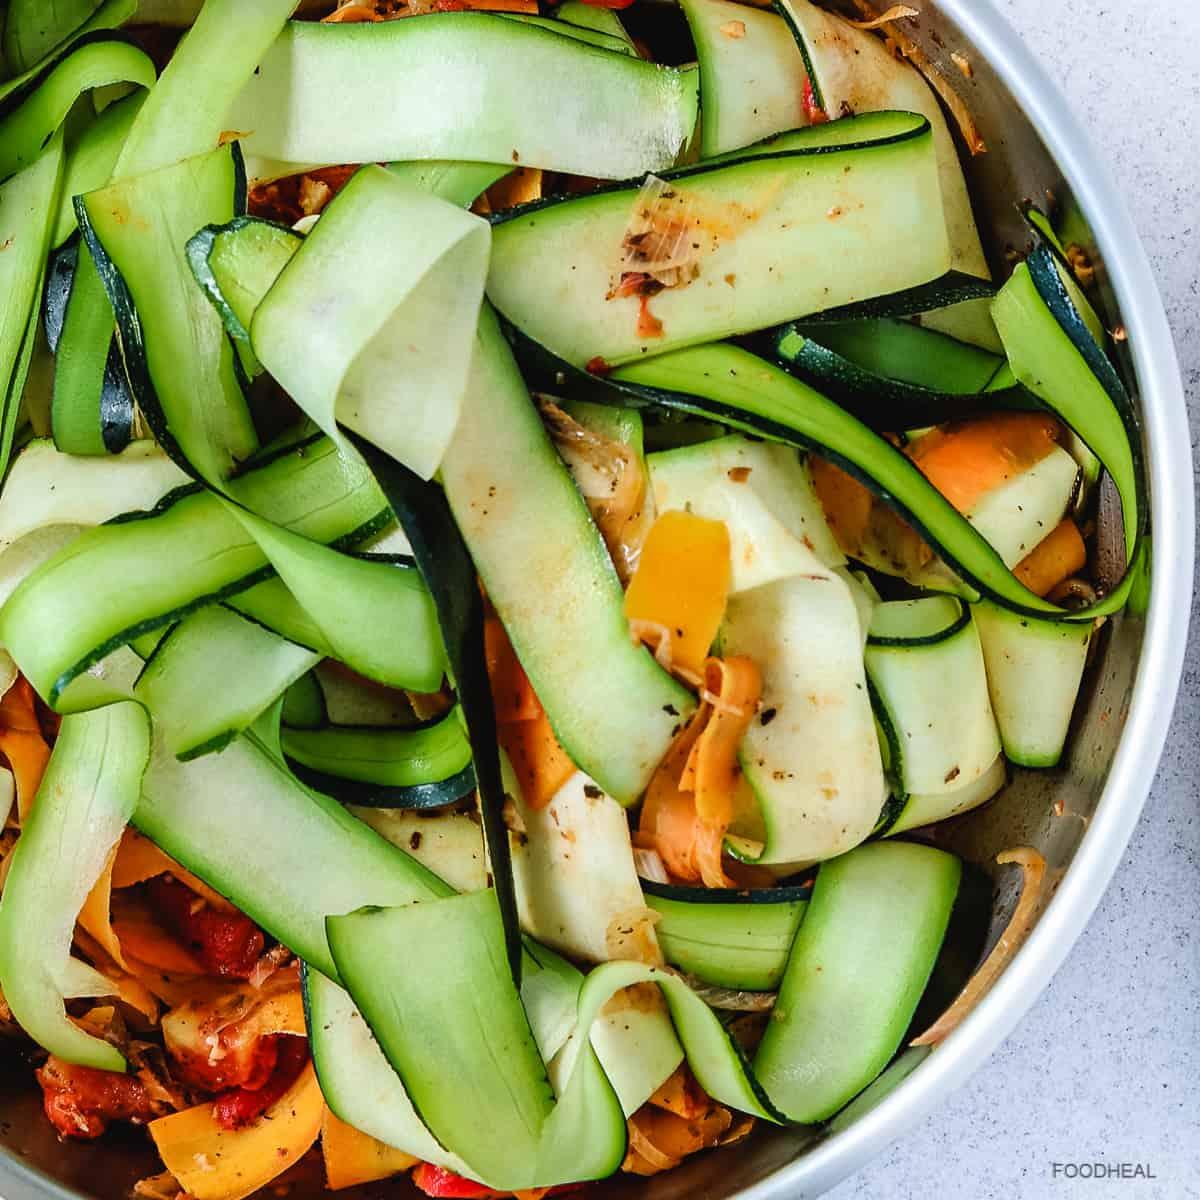 zucchini ribbons, zucchini noodles, zucchini pasta